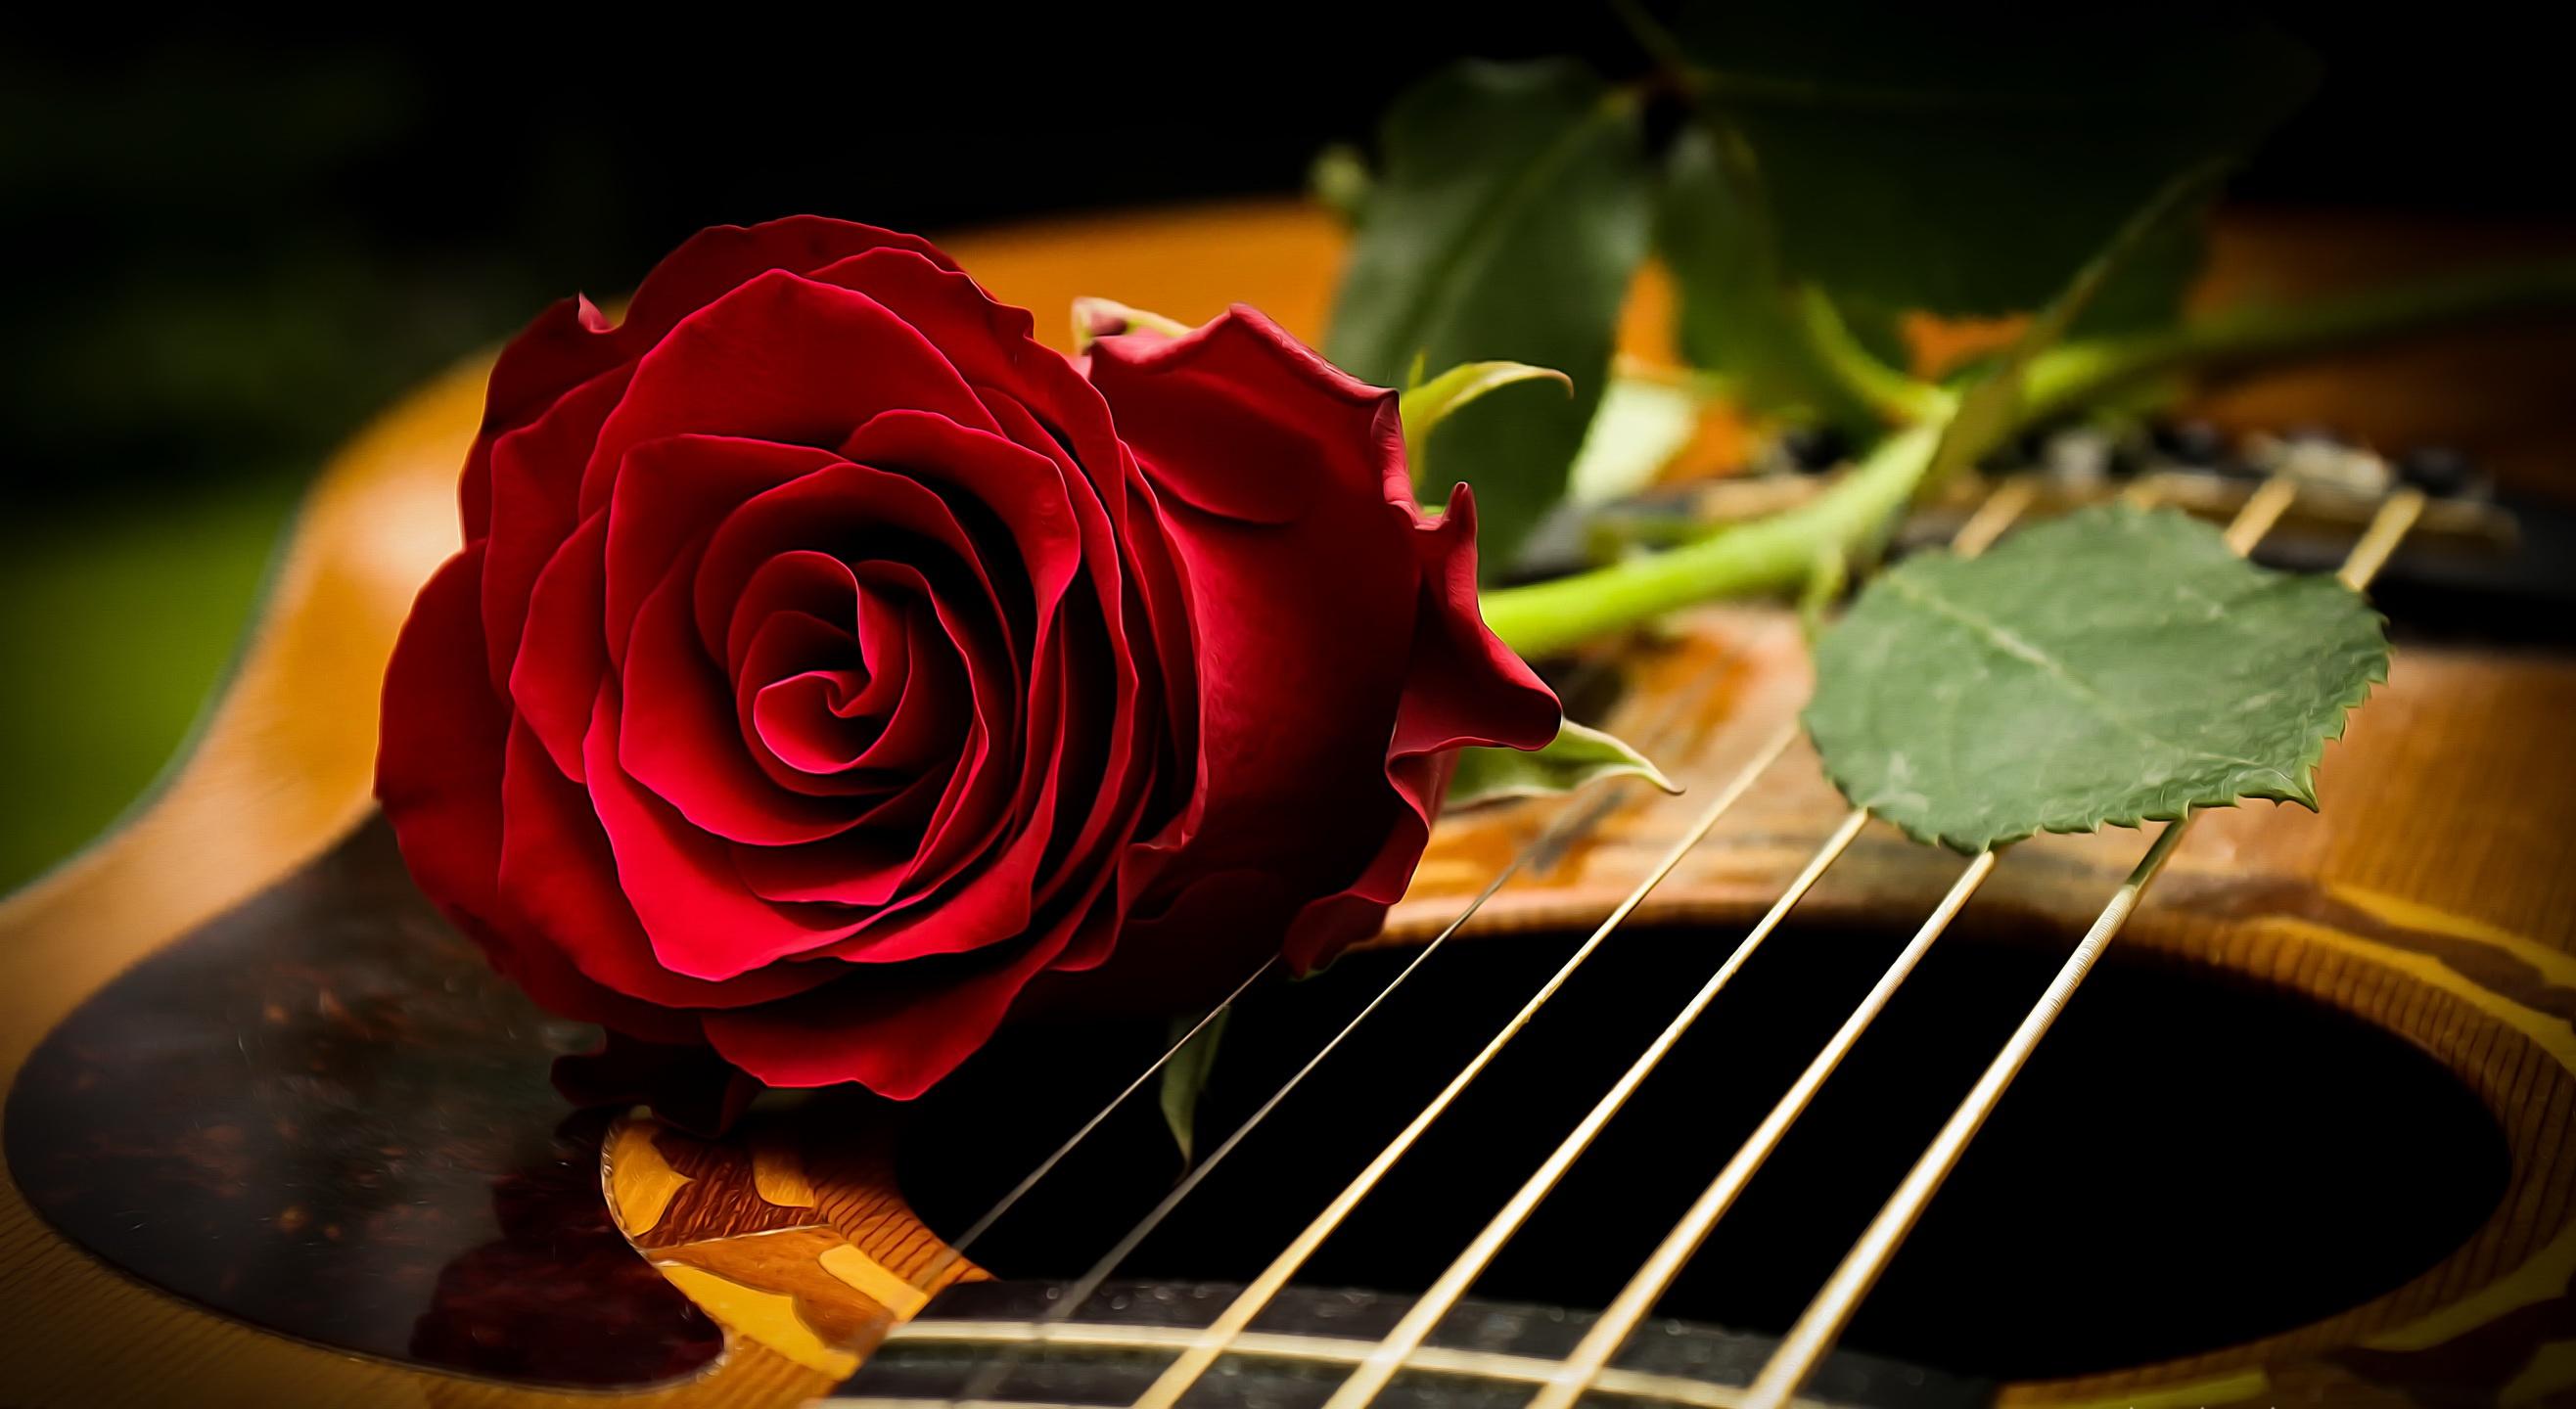 Beautiful Wallpaper Music Rose - musical-instrument-rose-flowers-guitar-red-flowers-1168893  Trends_46342.jpg